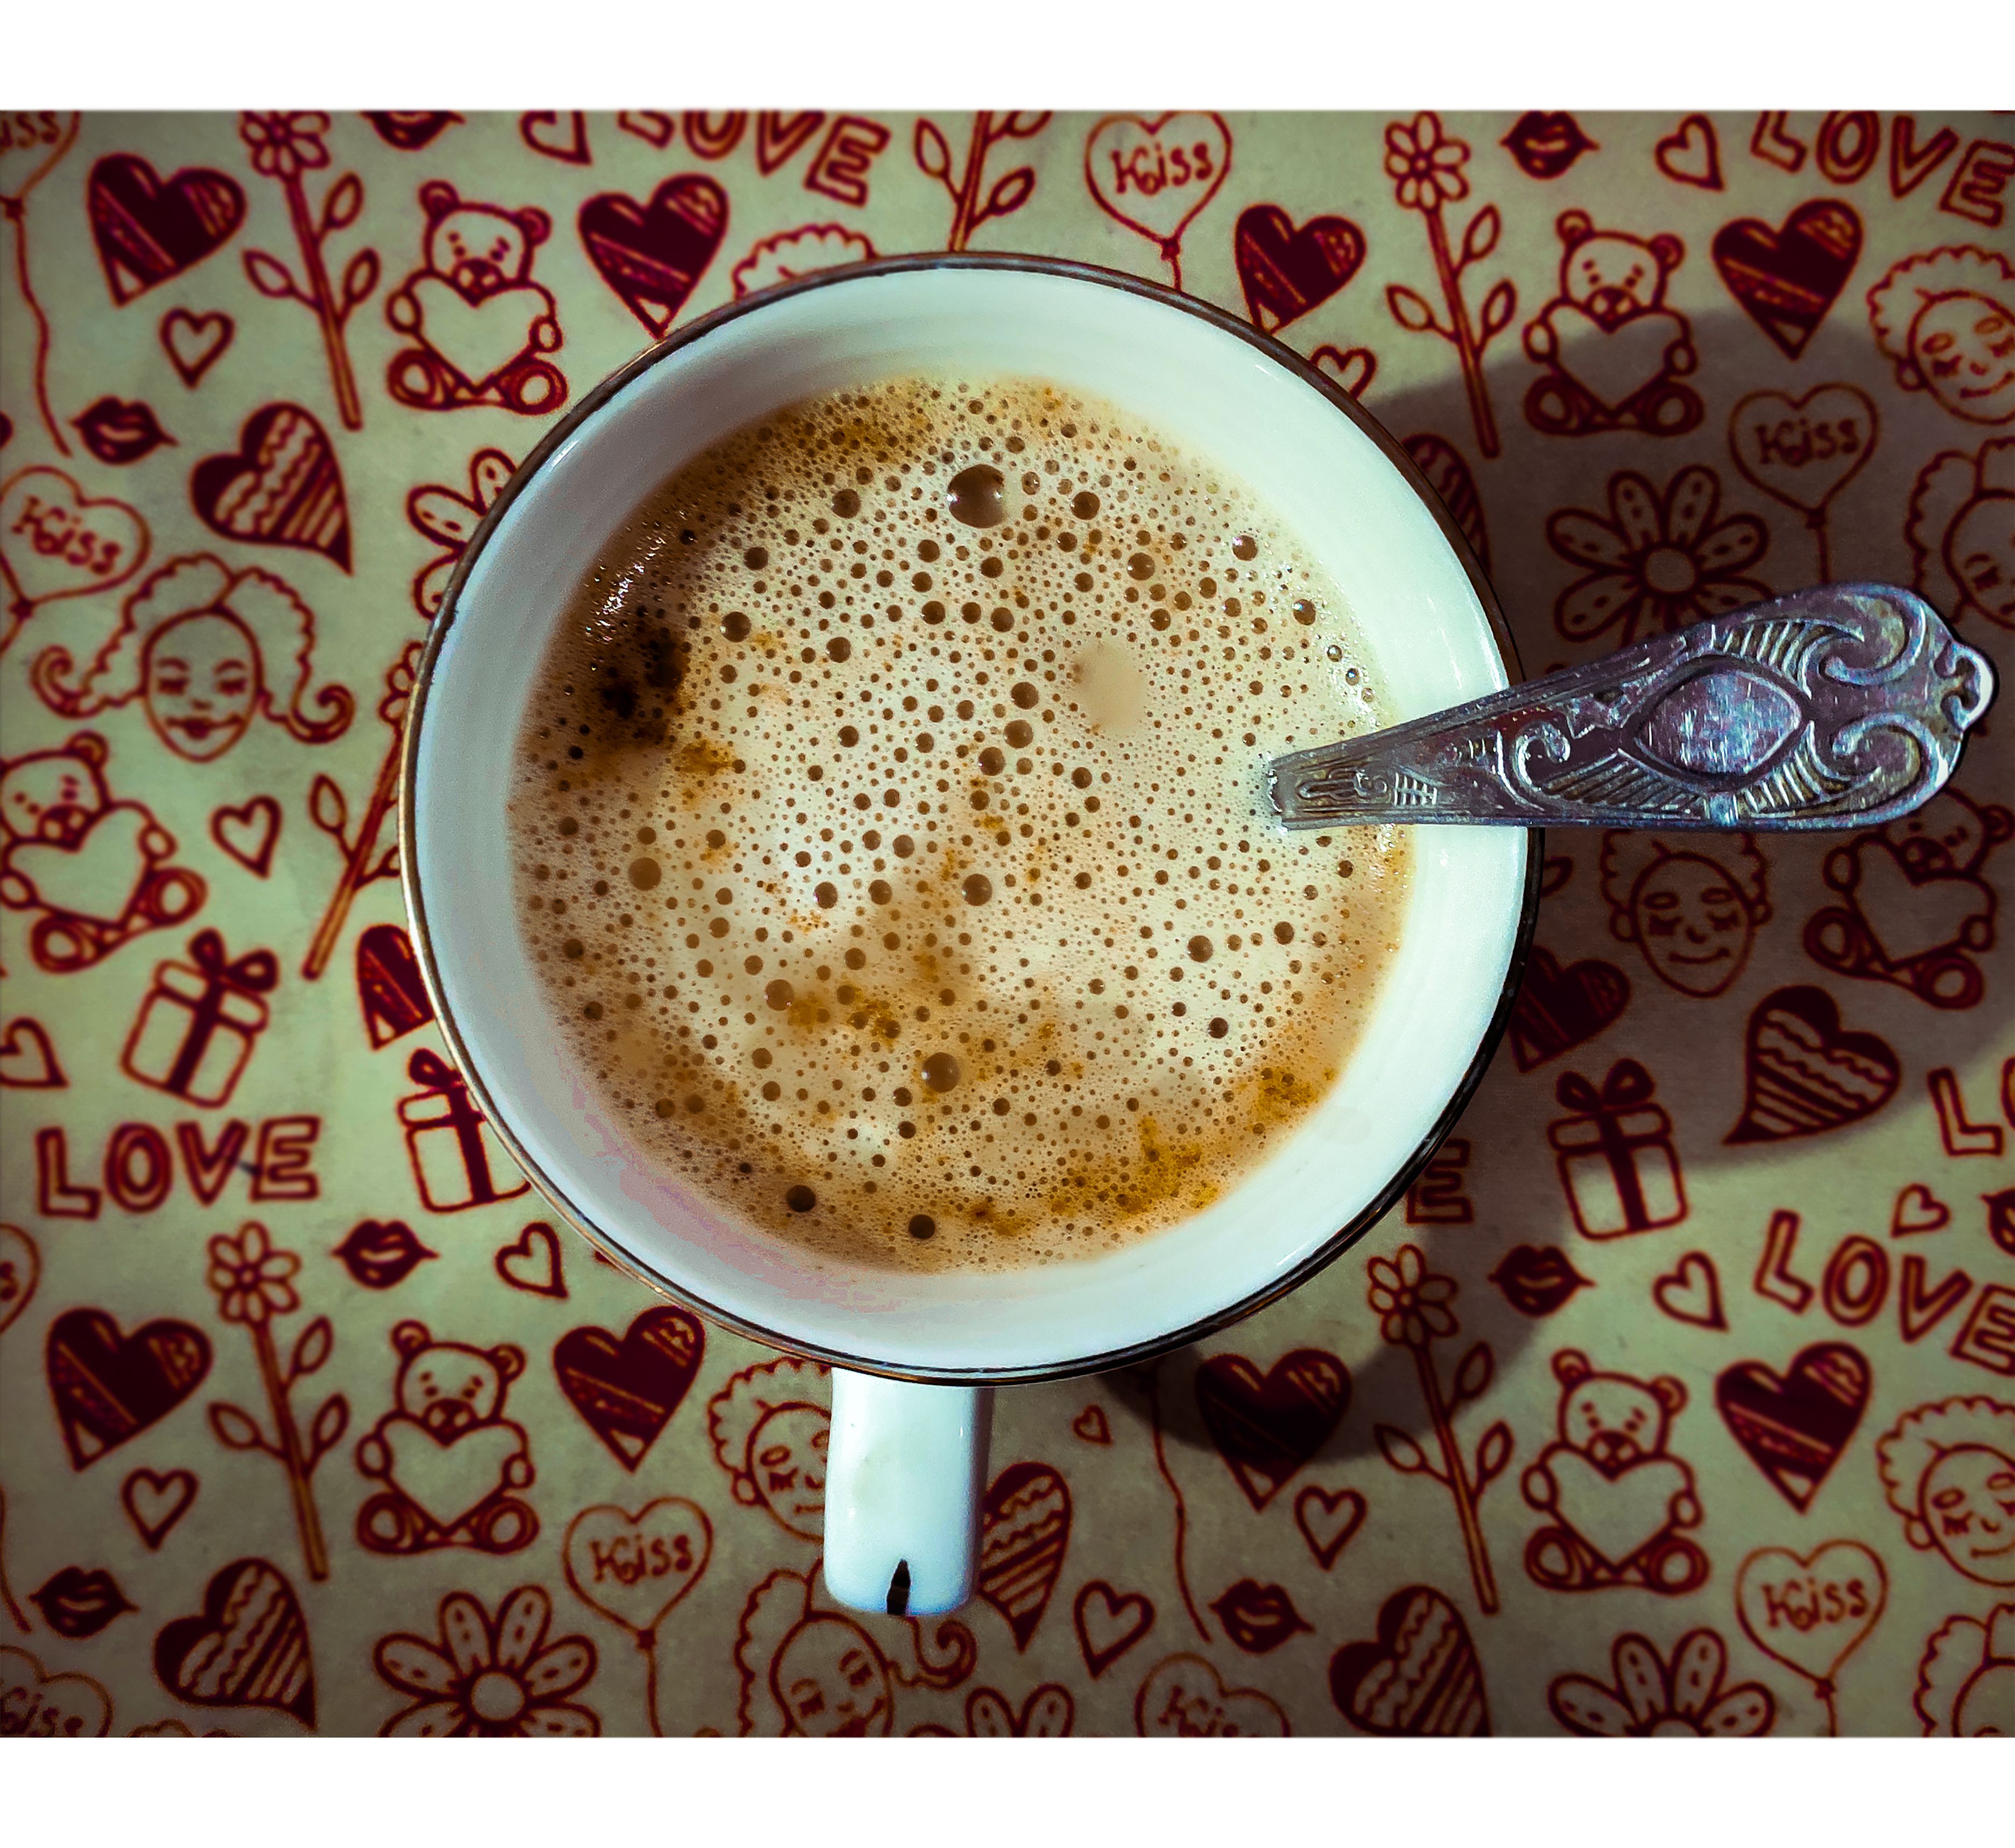 Love Coffee Kiss CoffeeLove Coffee Kiss Coffee